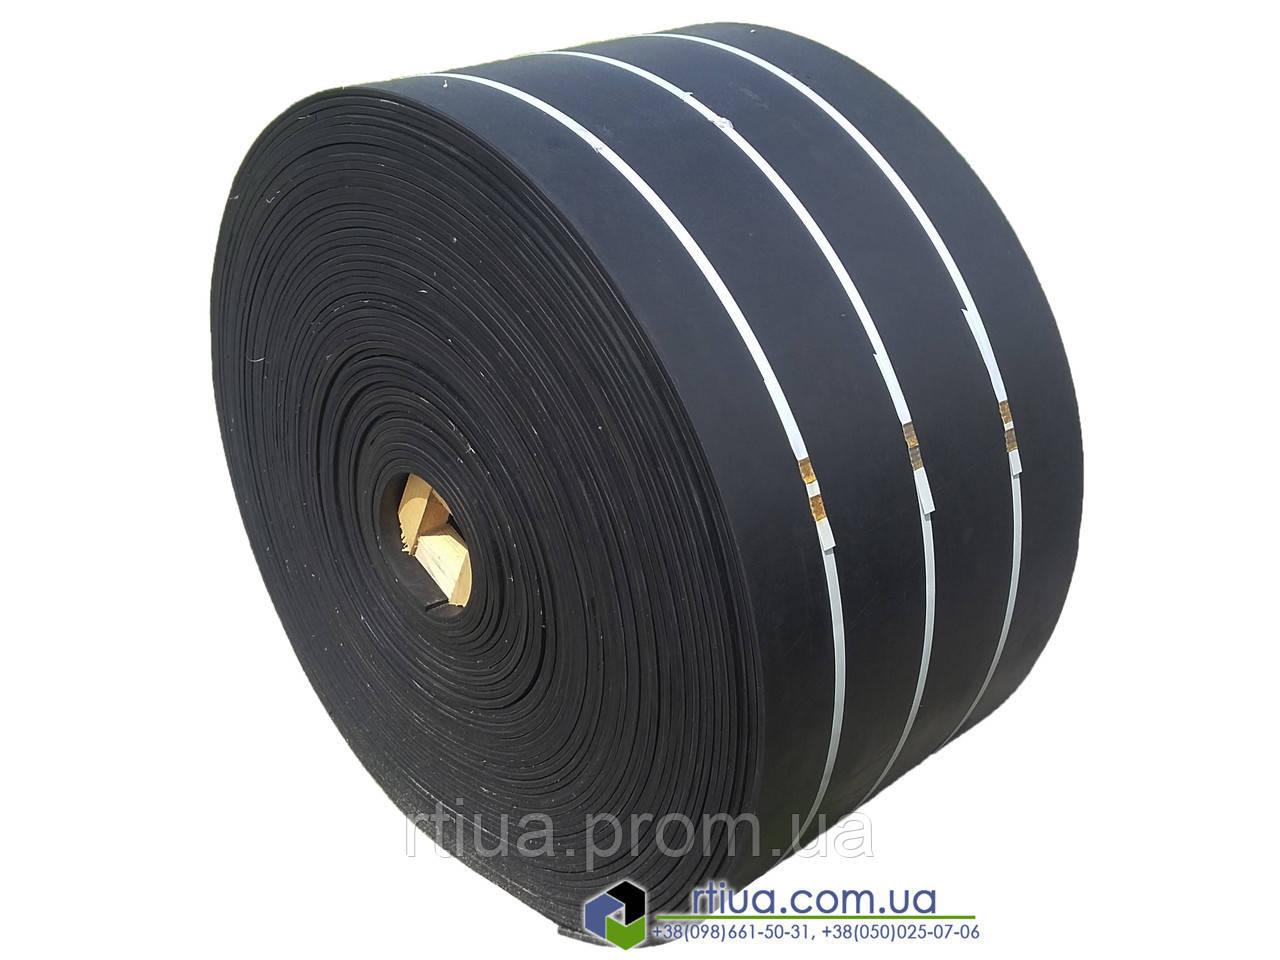 Конвейерная лента 600х7 мм